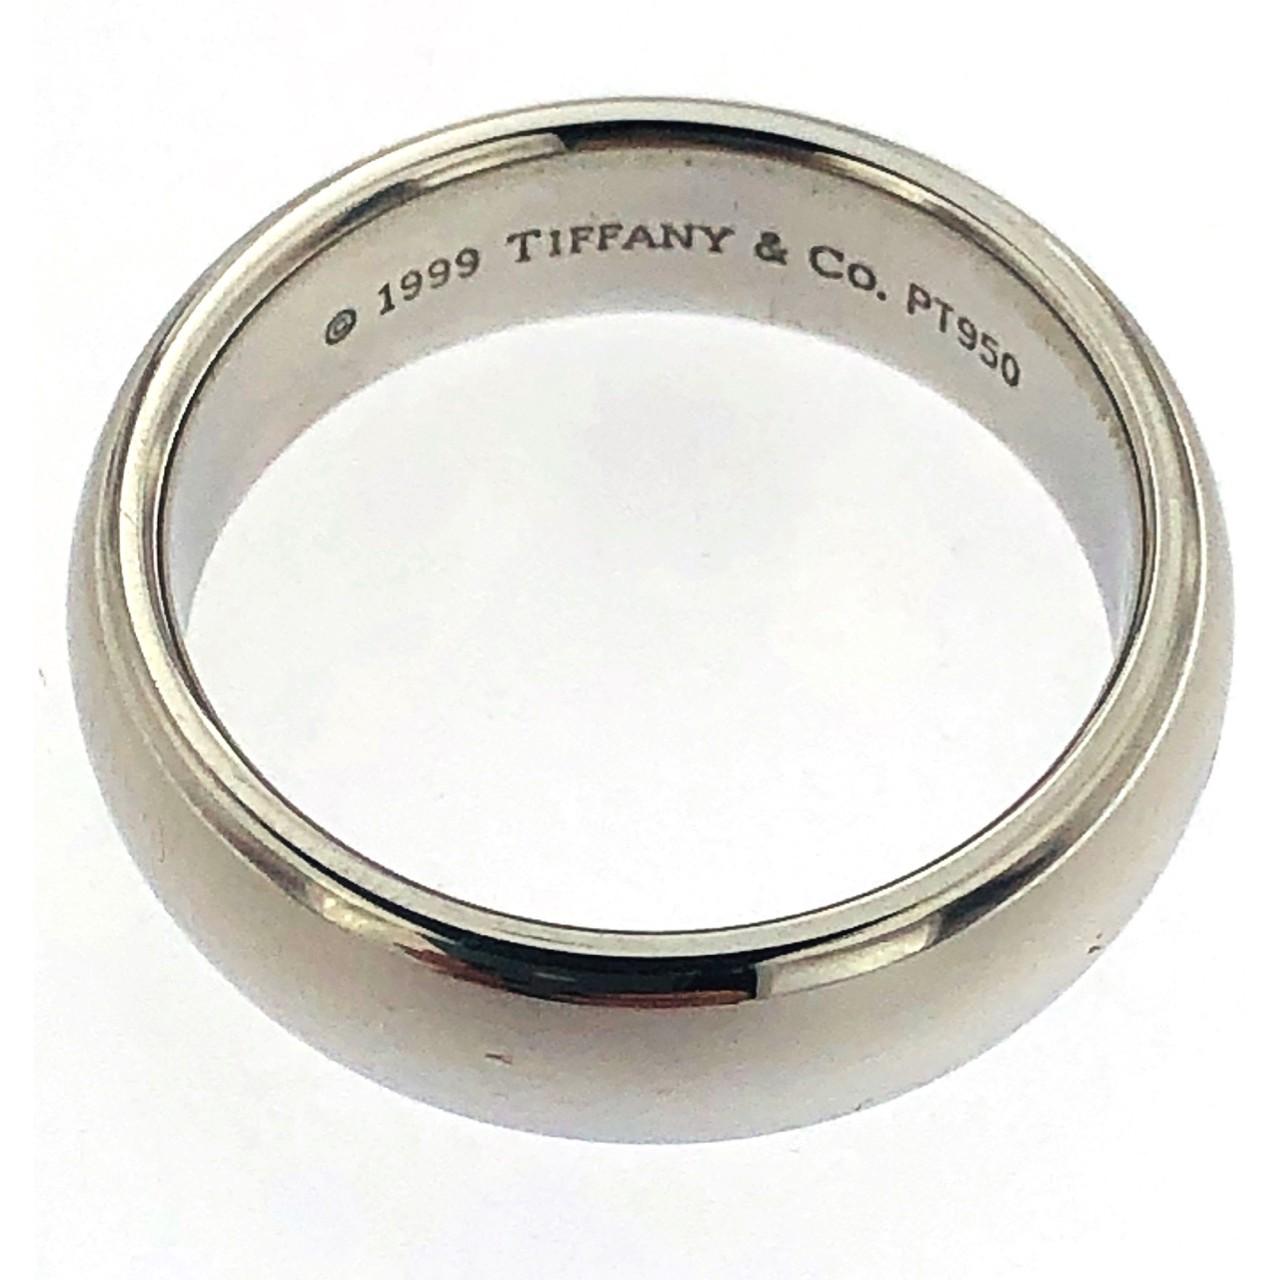 le dernier 20c45 a8a01 Bague en platine de marque Tiffany 1999 Tiffany & Co